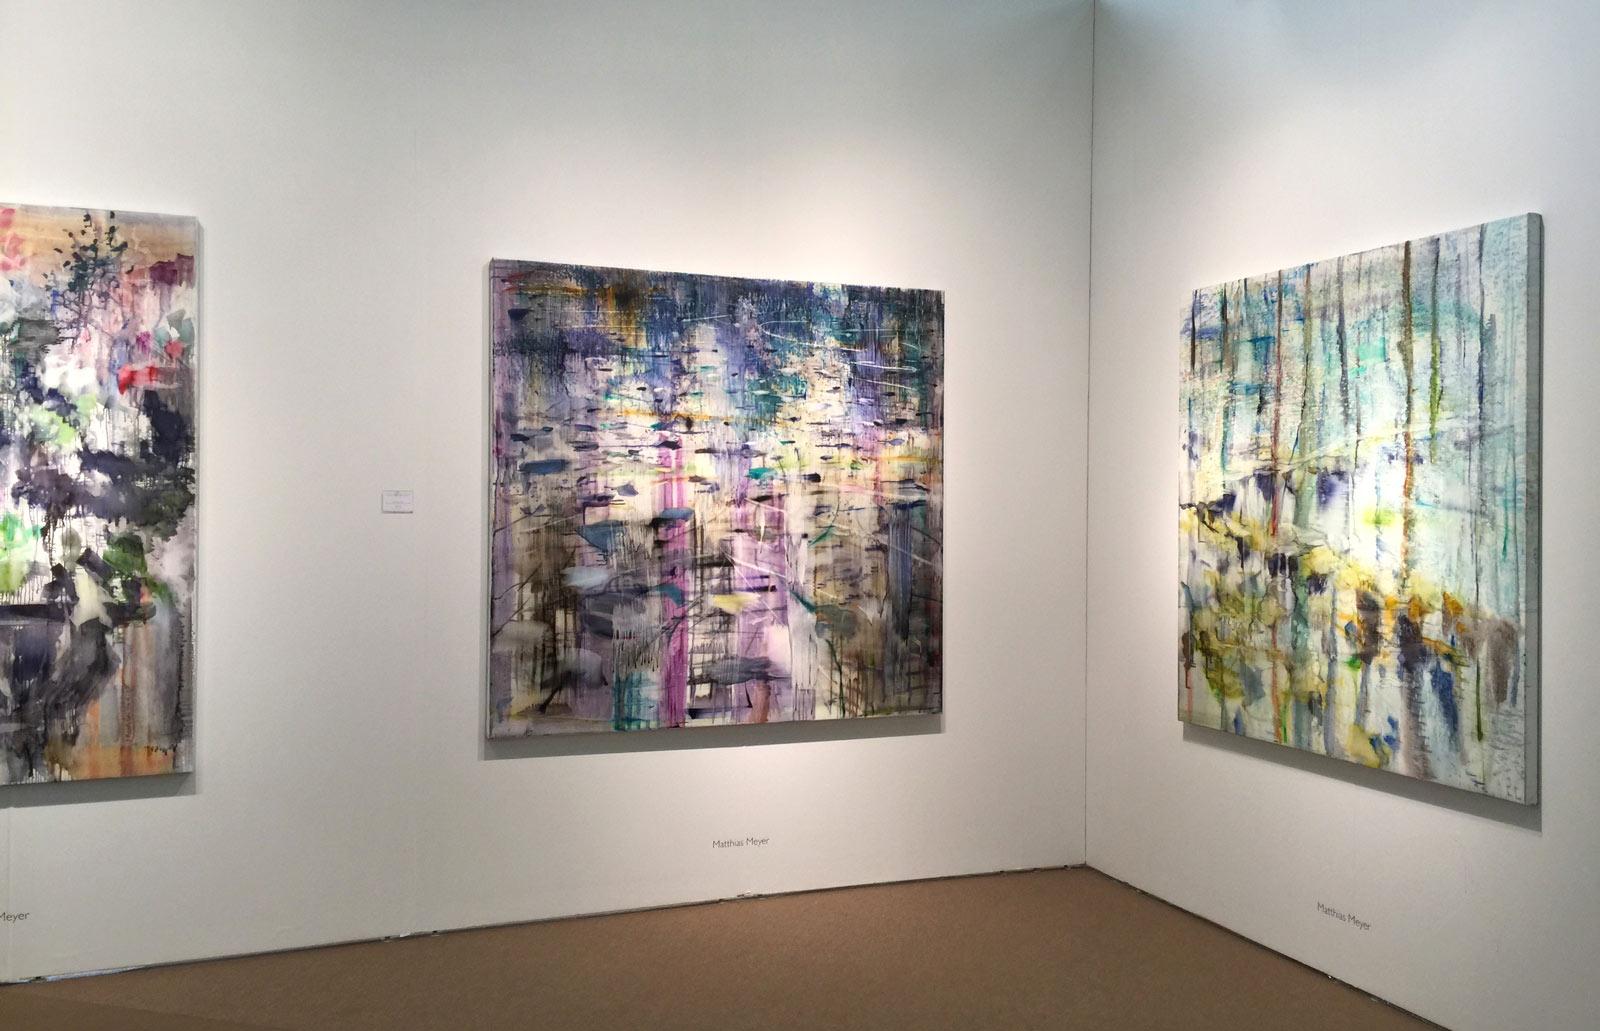 Matthias-Meyer-abstract-Paintings-canvas-art-fair.jpg